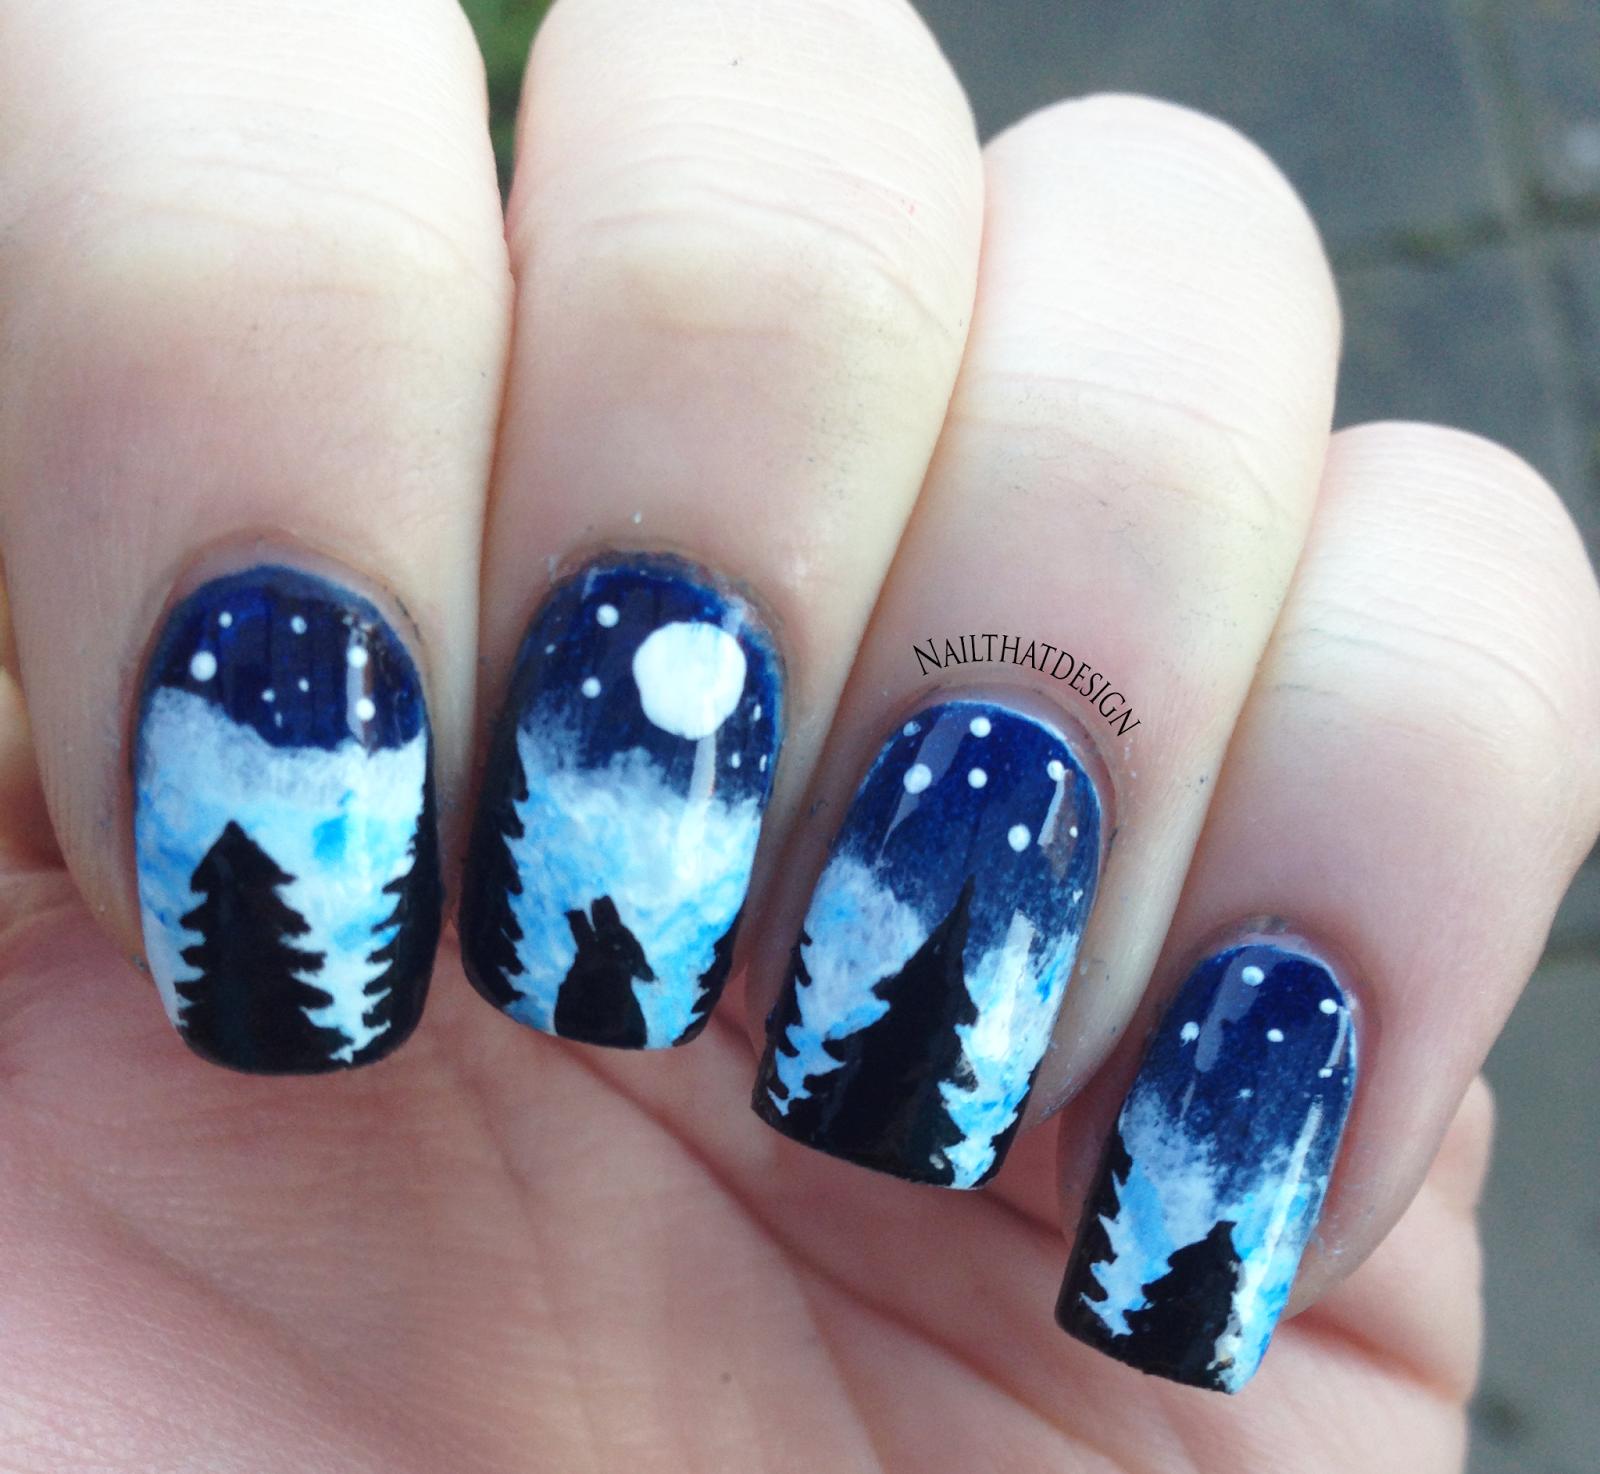 NailThatDesign: Detailed wolf mani | Neglelak | Pinterest | Animal ...